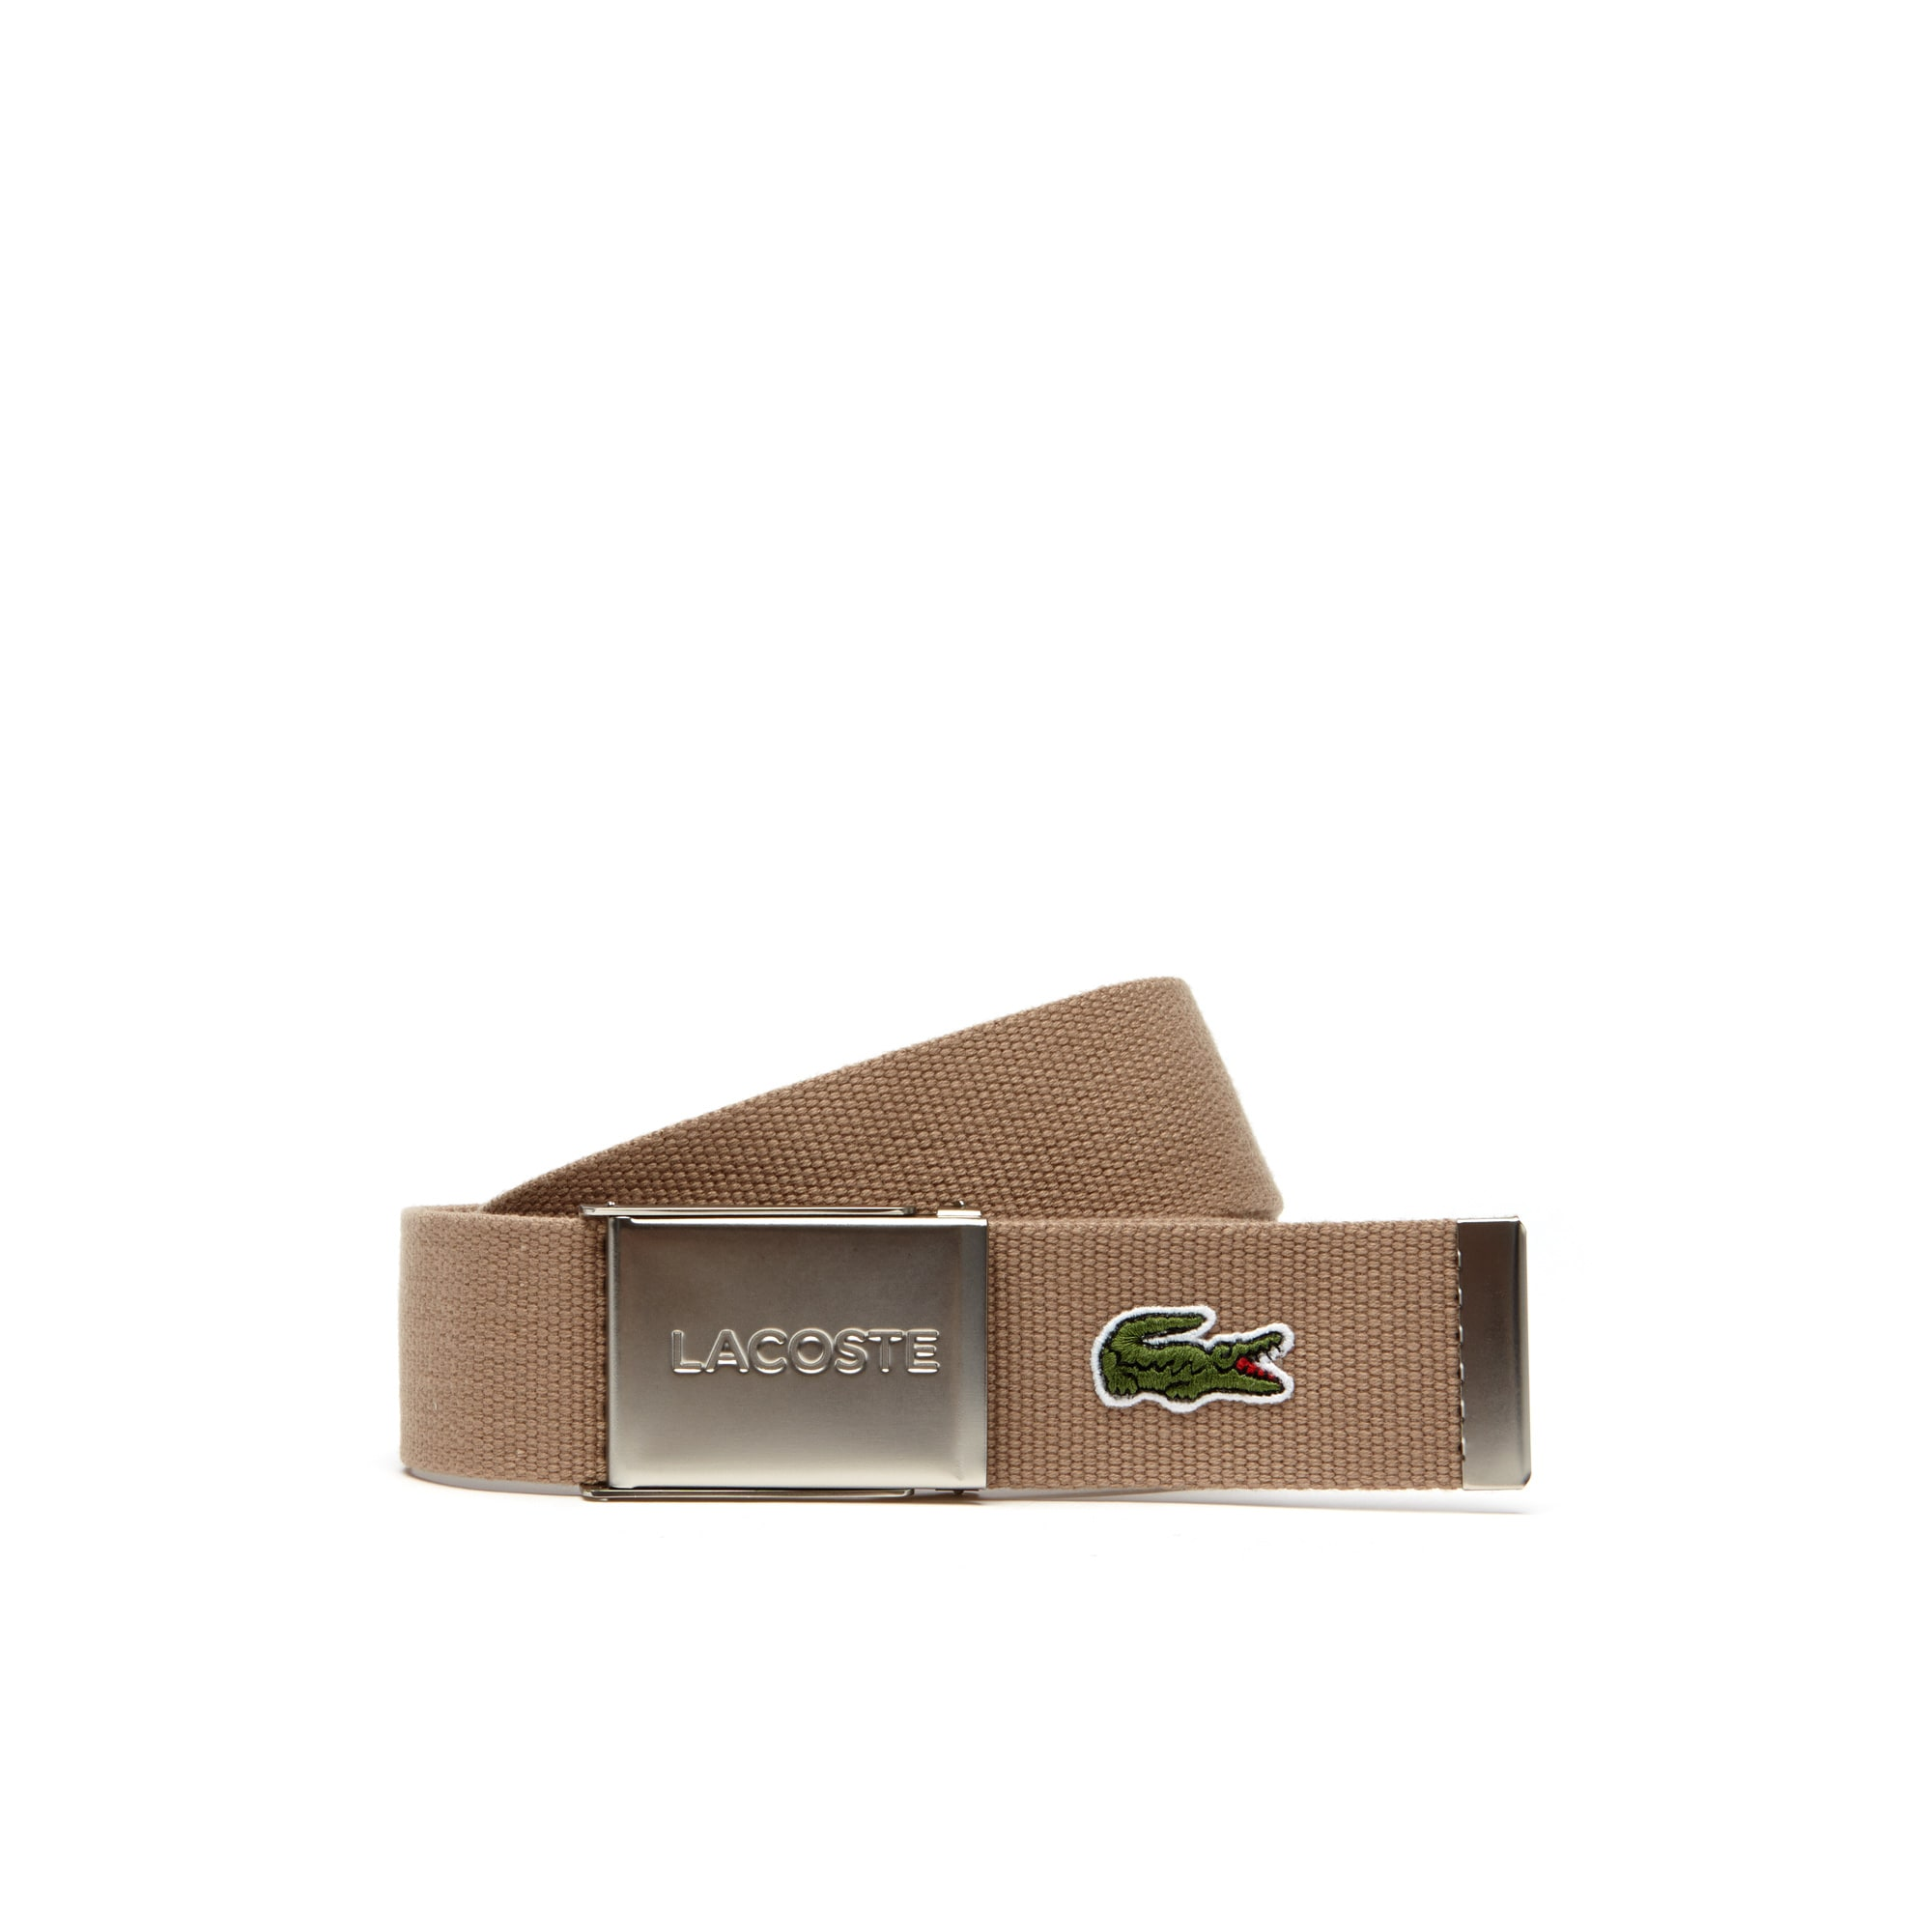 Geweven riem, Made in France-editie, platte gesp met Lacoste-gravering